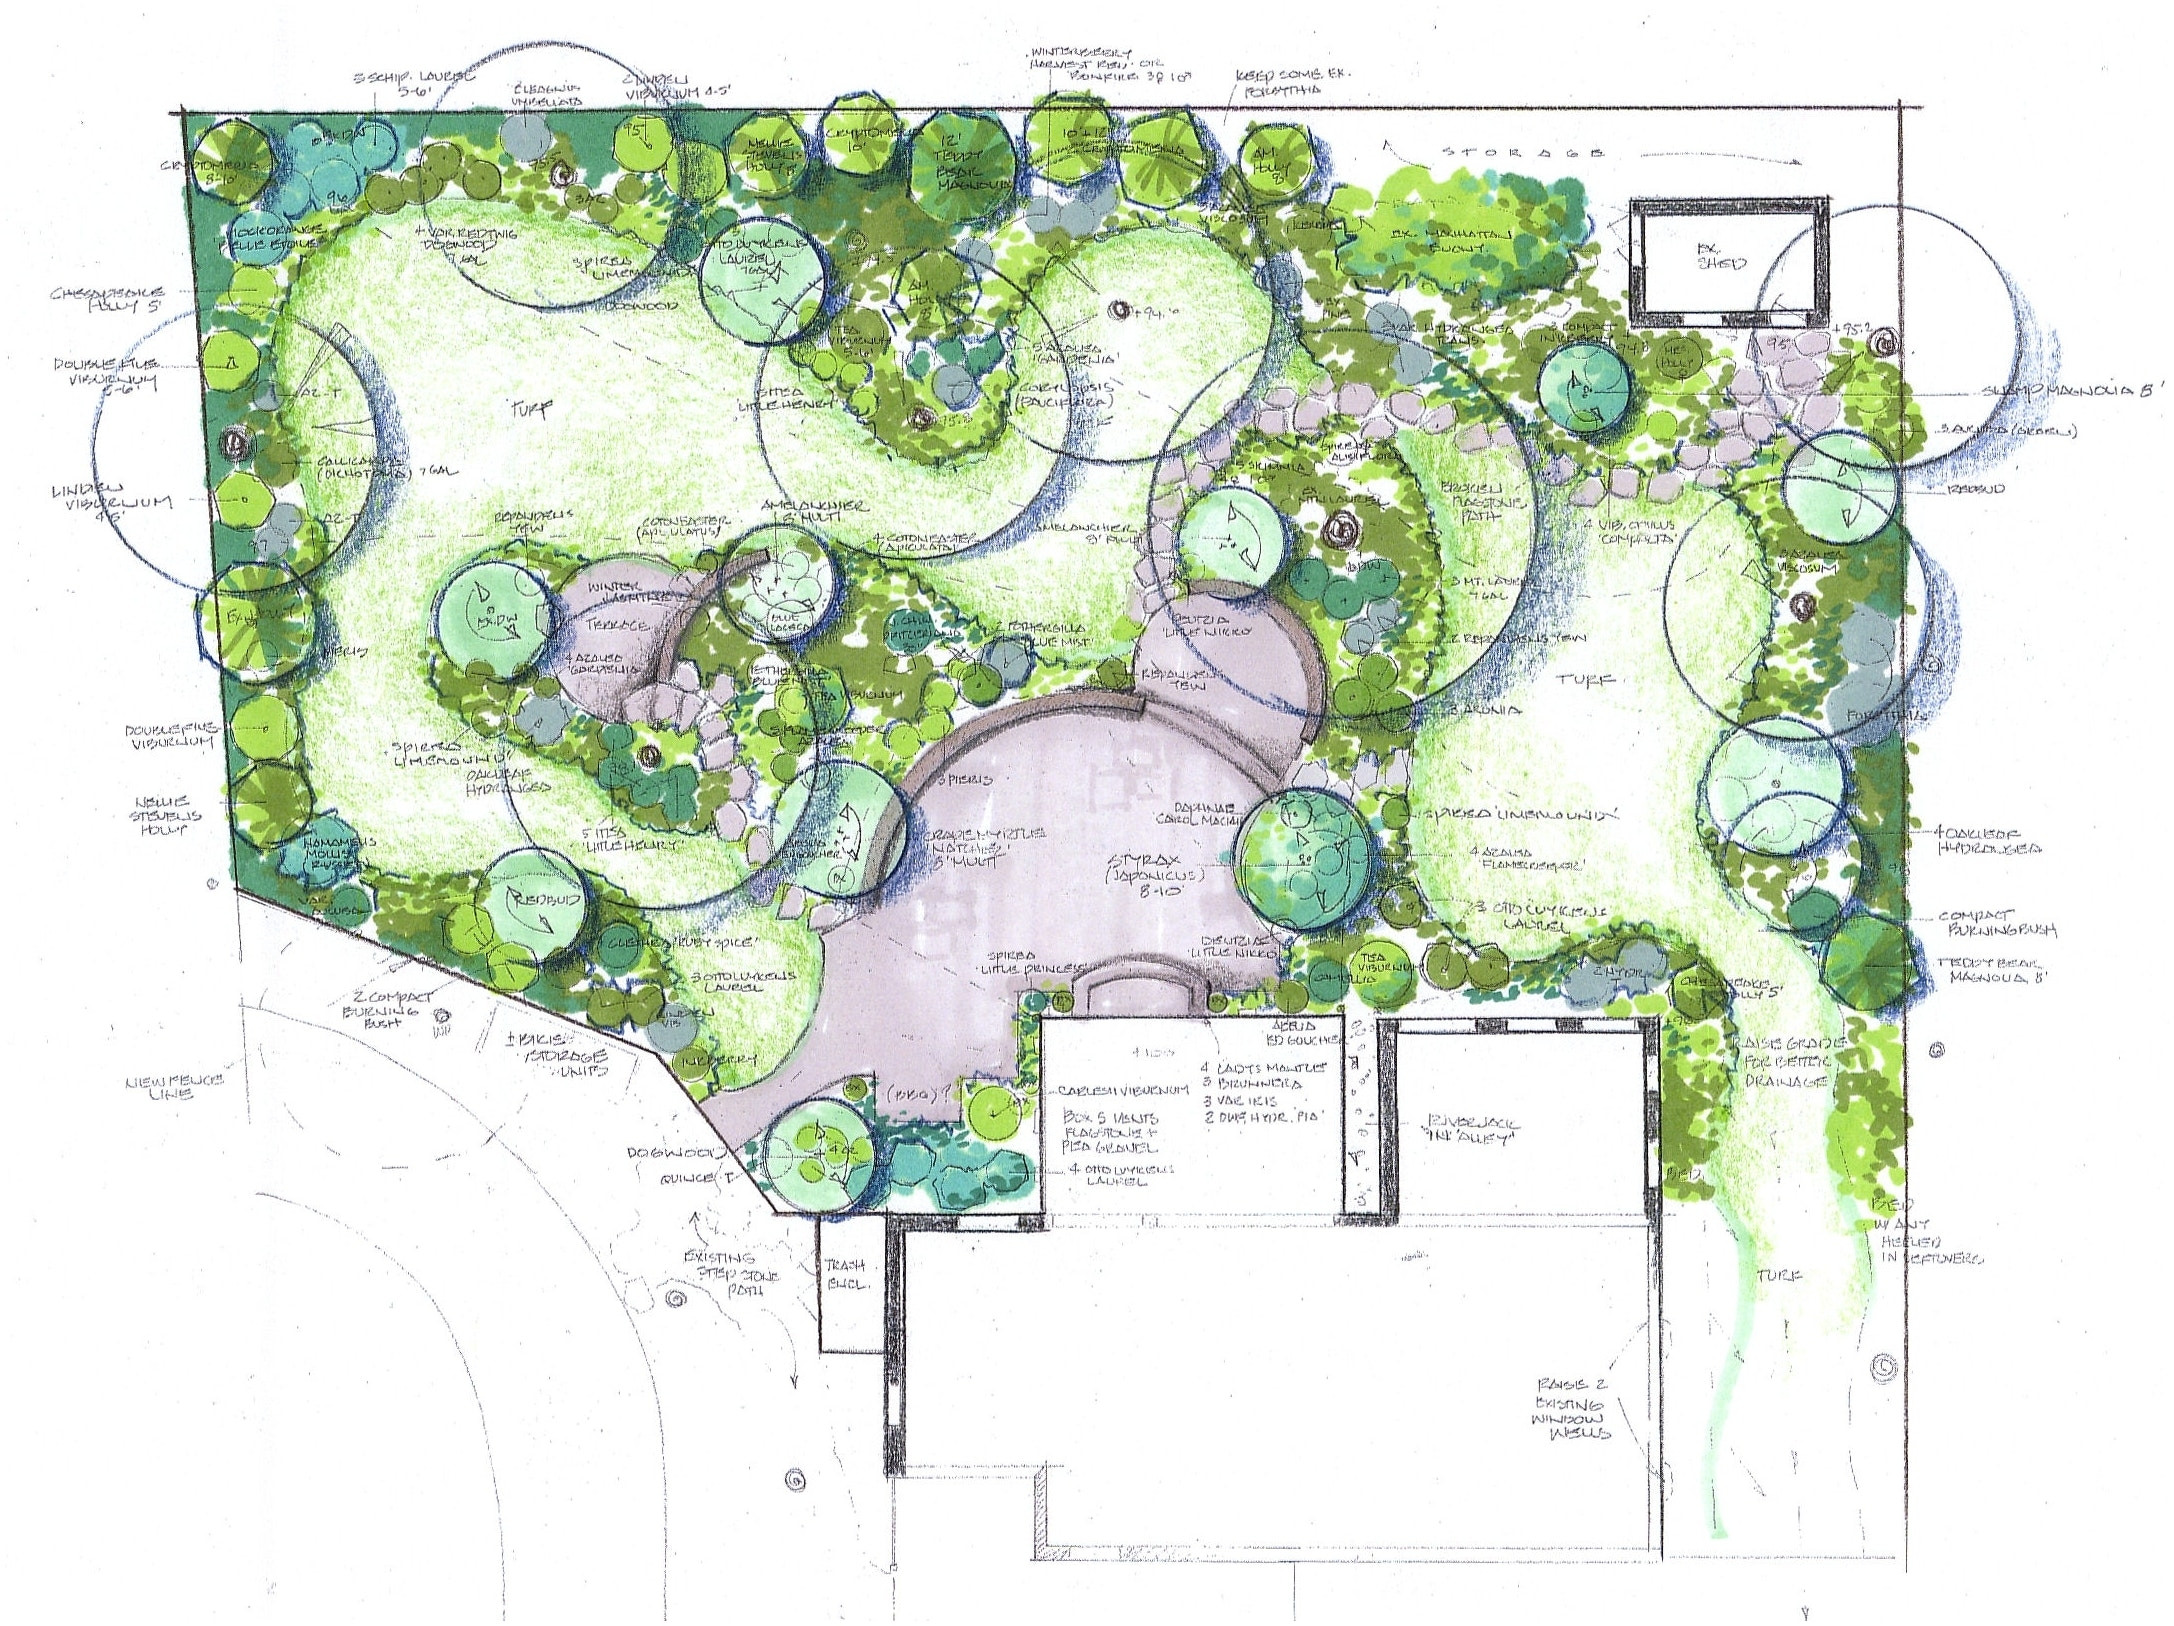 The Best Ideas for Free Online Landscape Design tool ...